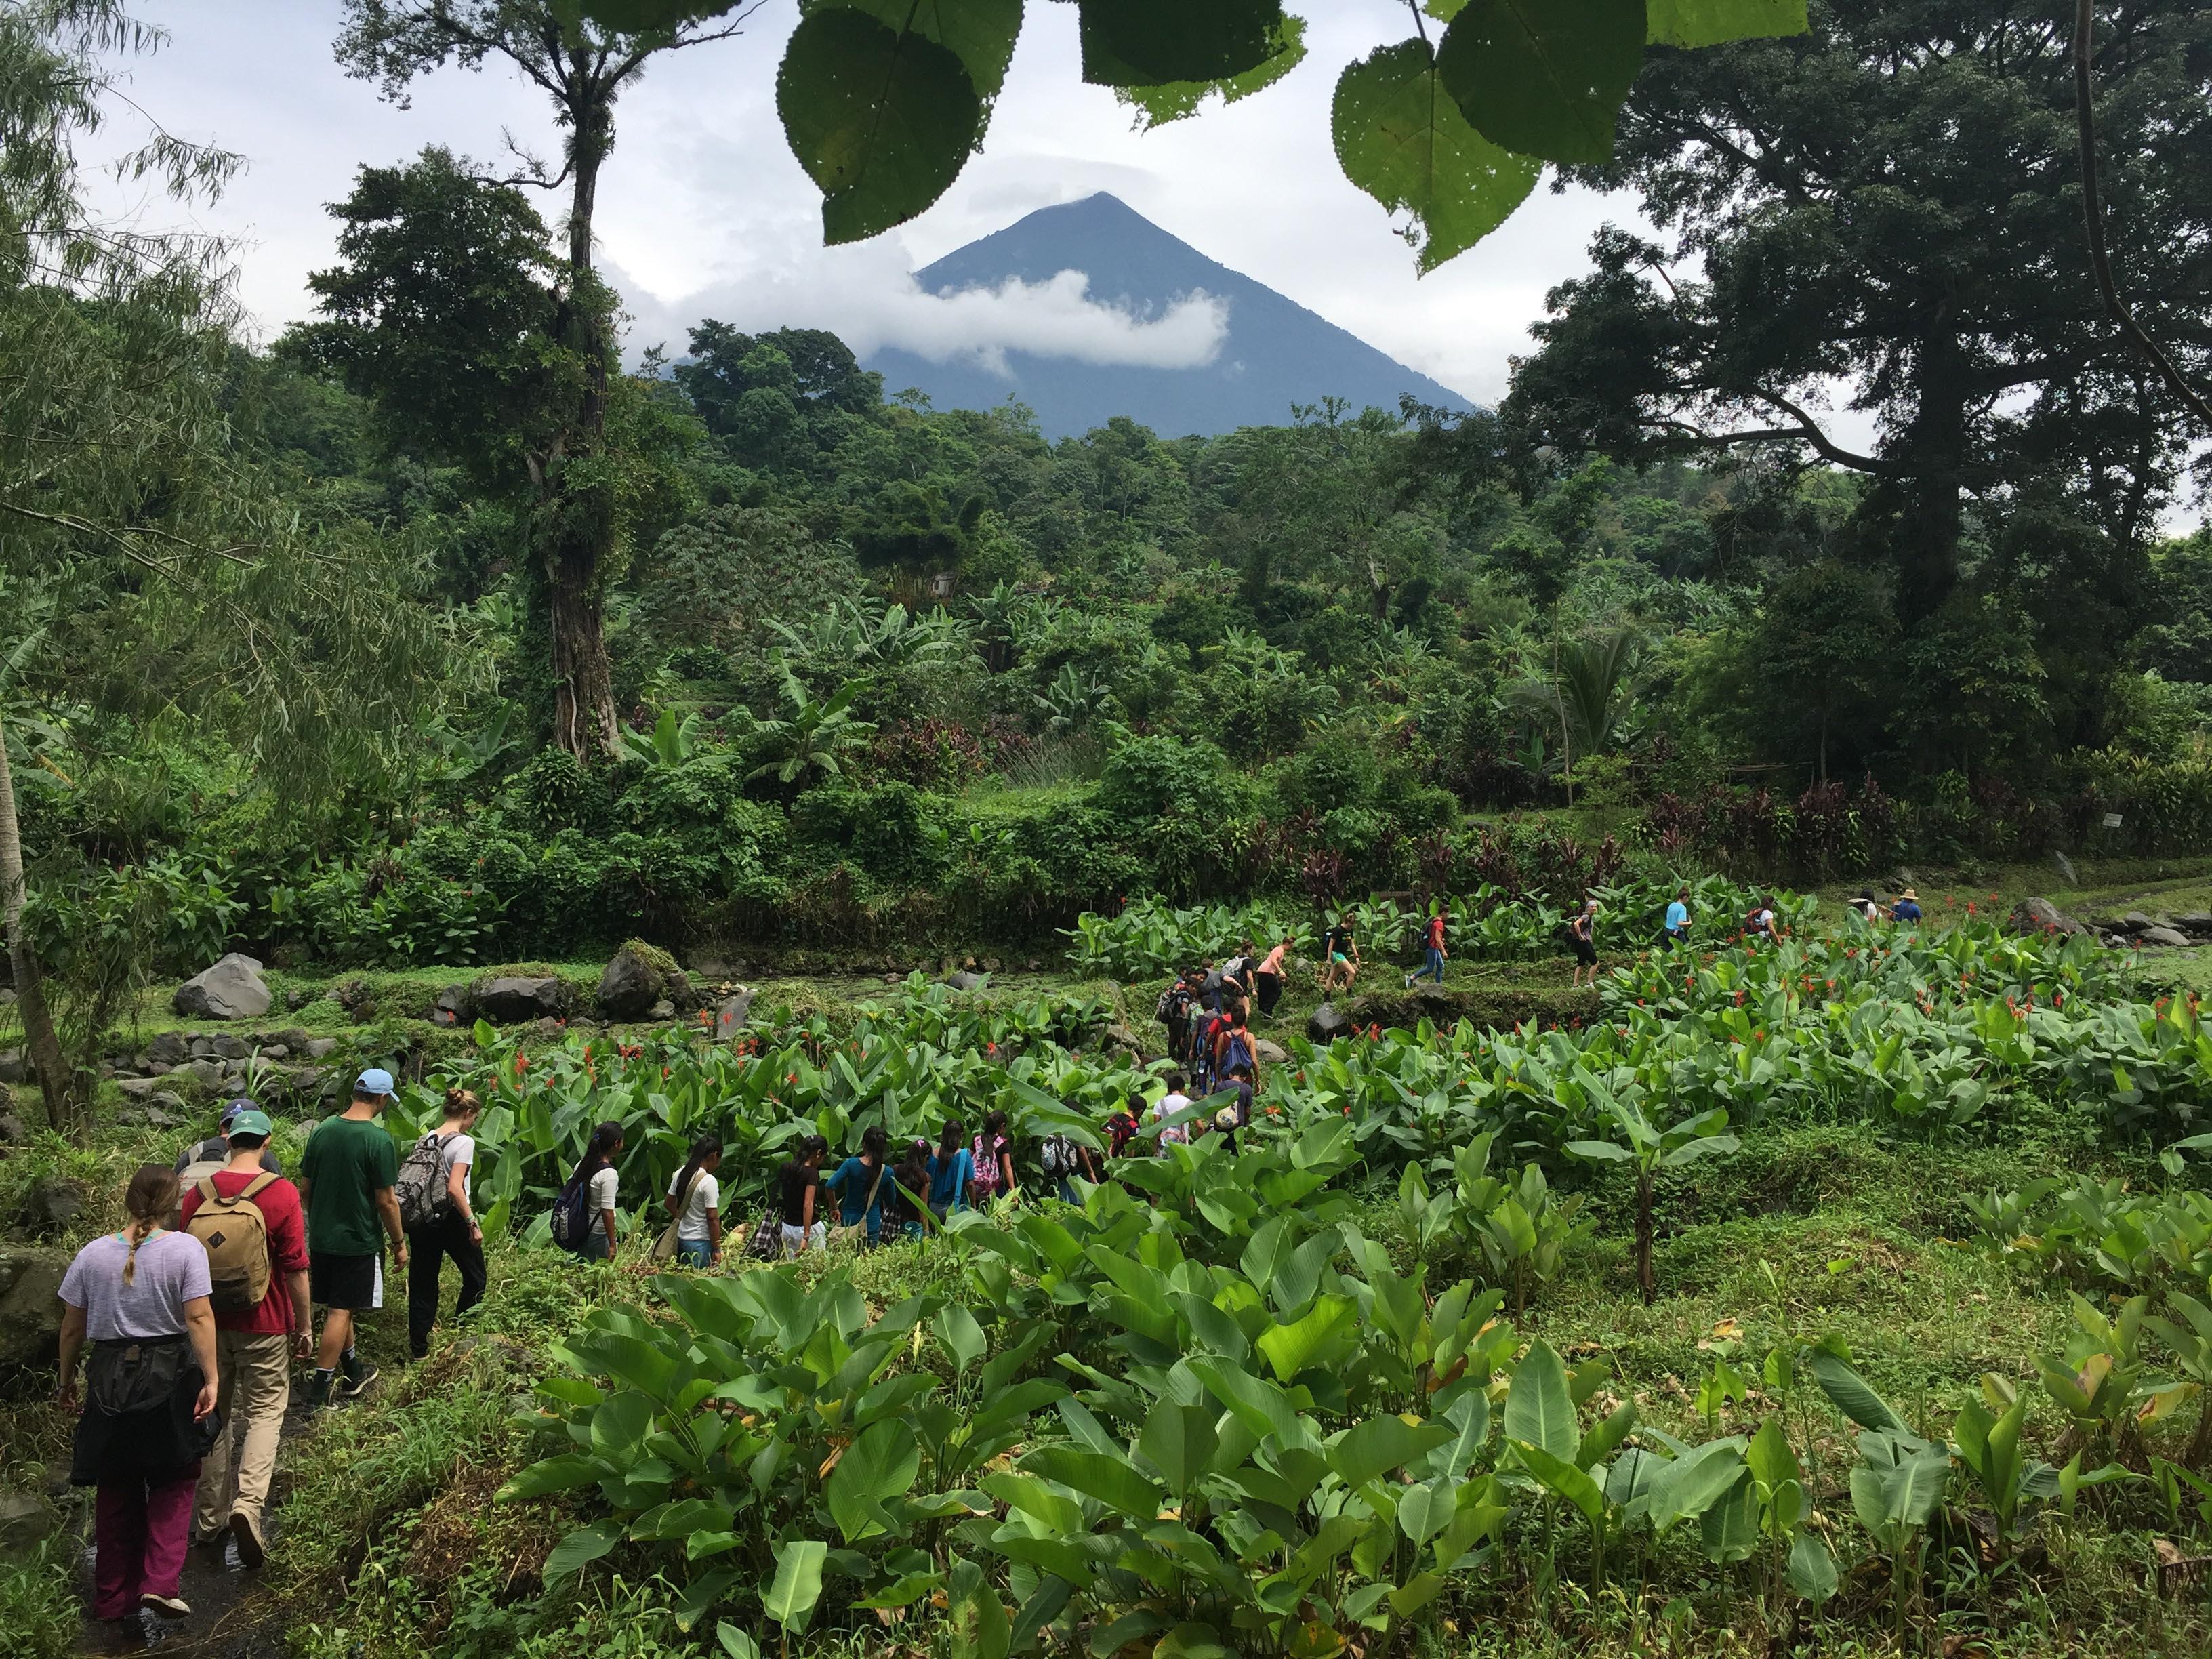 Proctor Academy Summer Service Guatemala-73.jpg